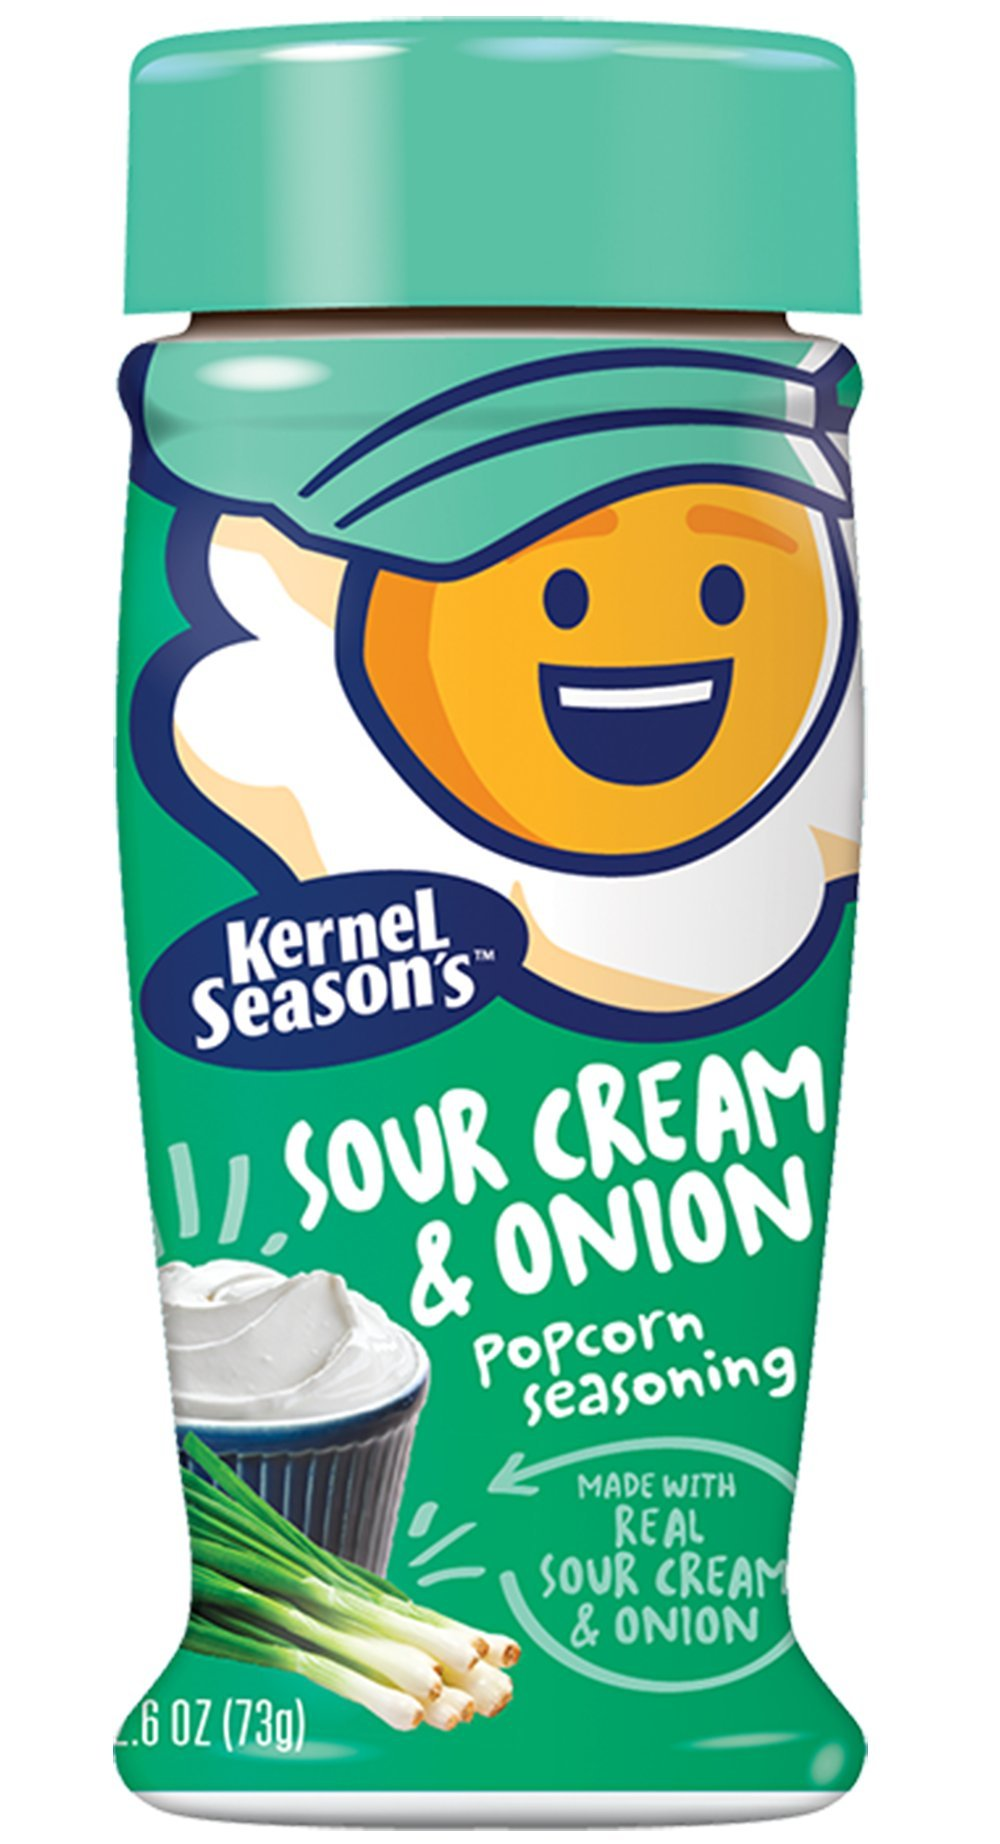 Kernel Season's Popcorn Seasoning, Sour Cream & Onion, 2.6 ounce (Pack of 6)